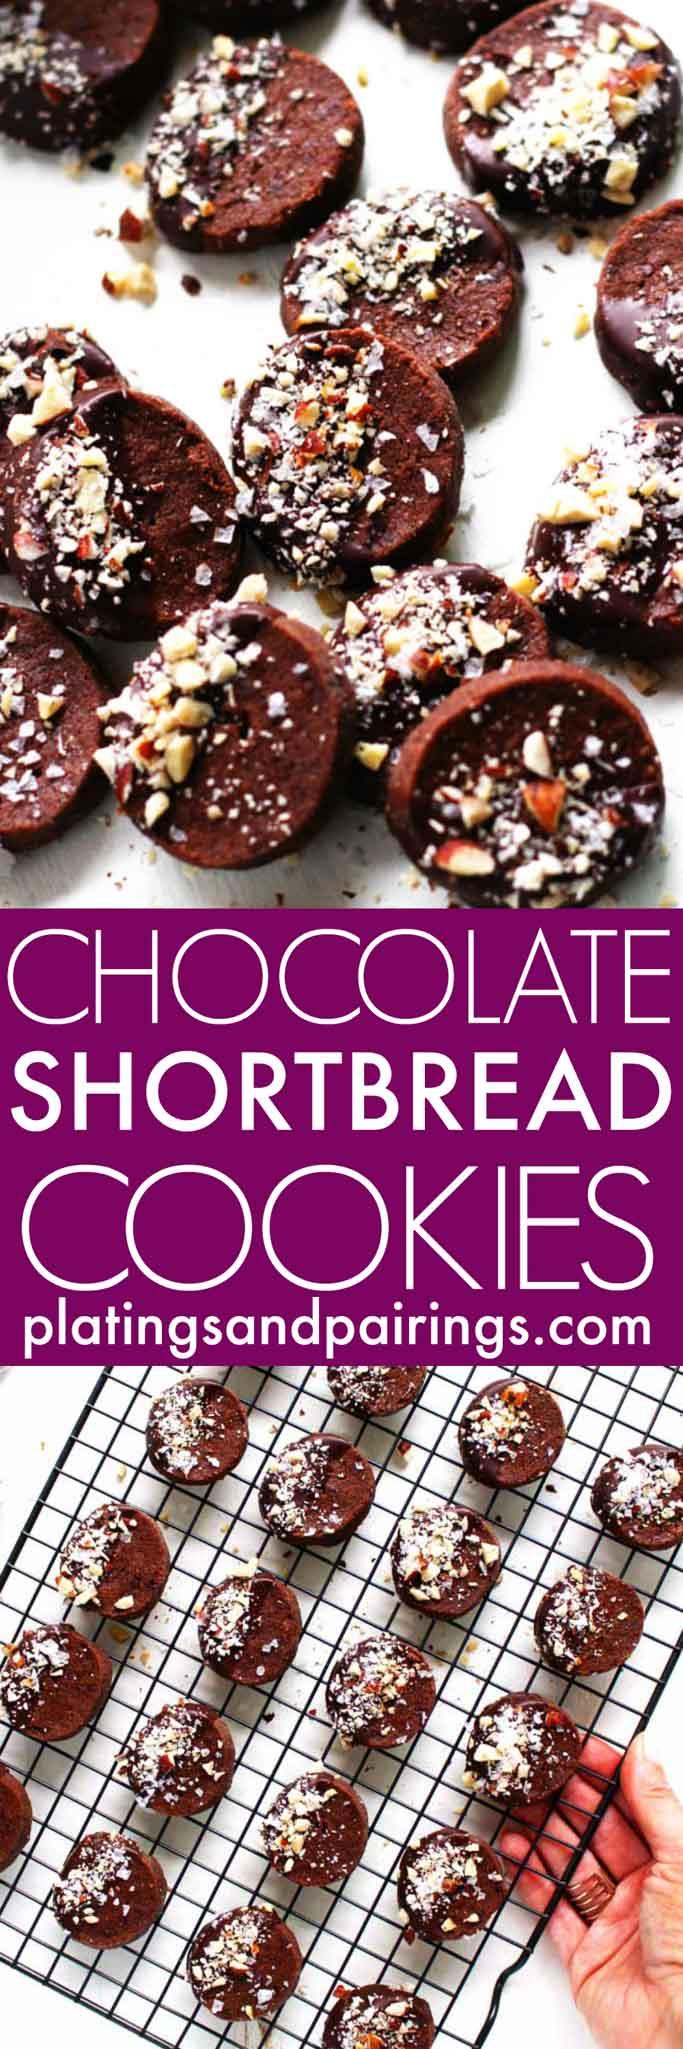 Oregon hazelnut cookie recipes